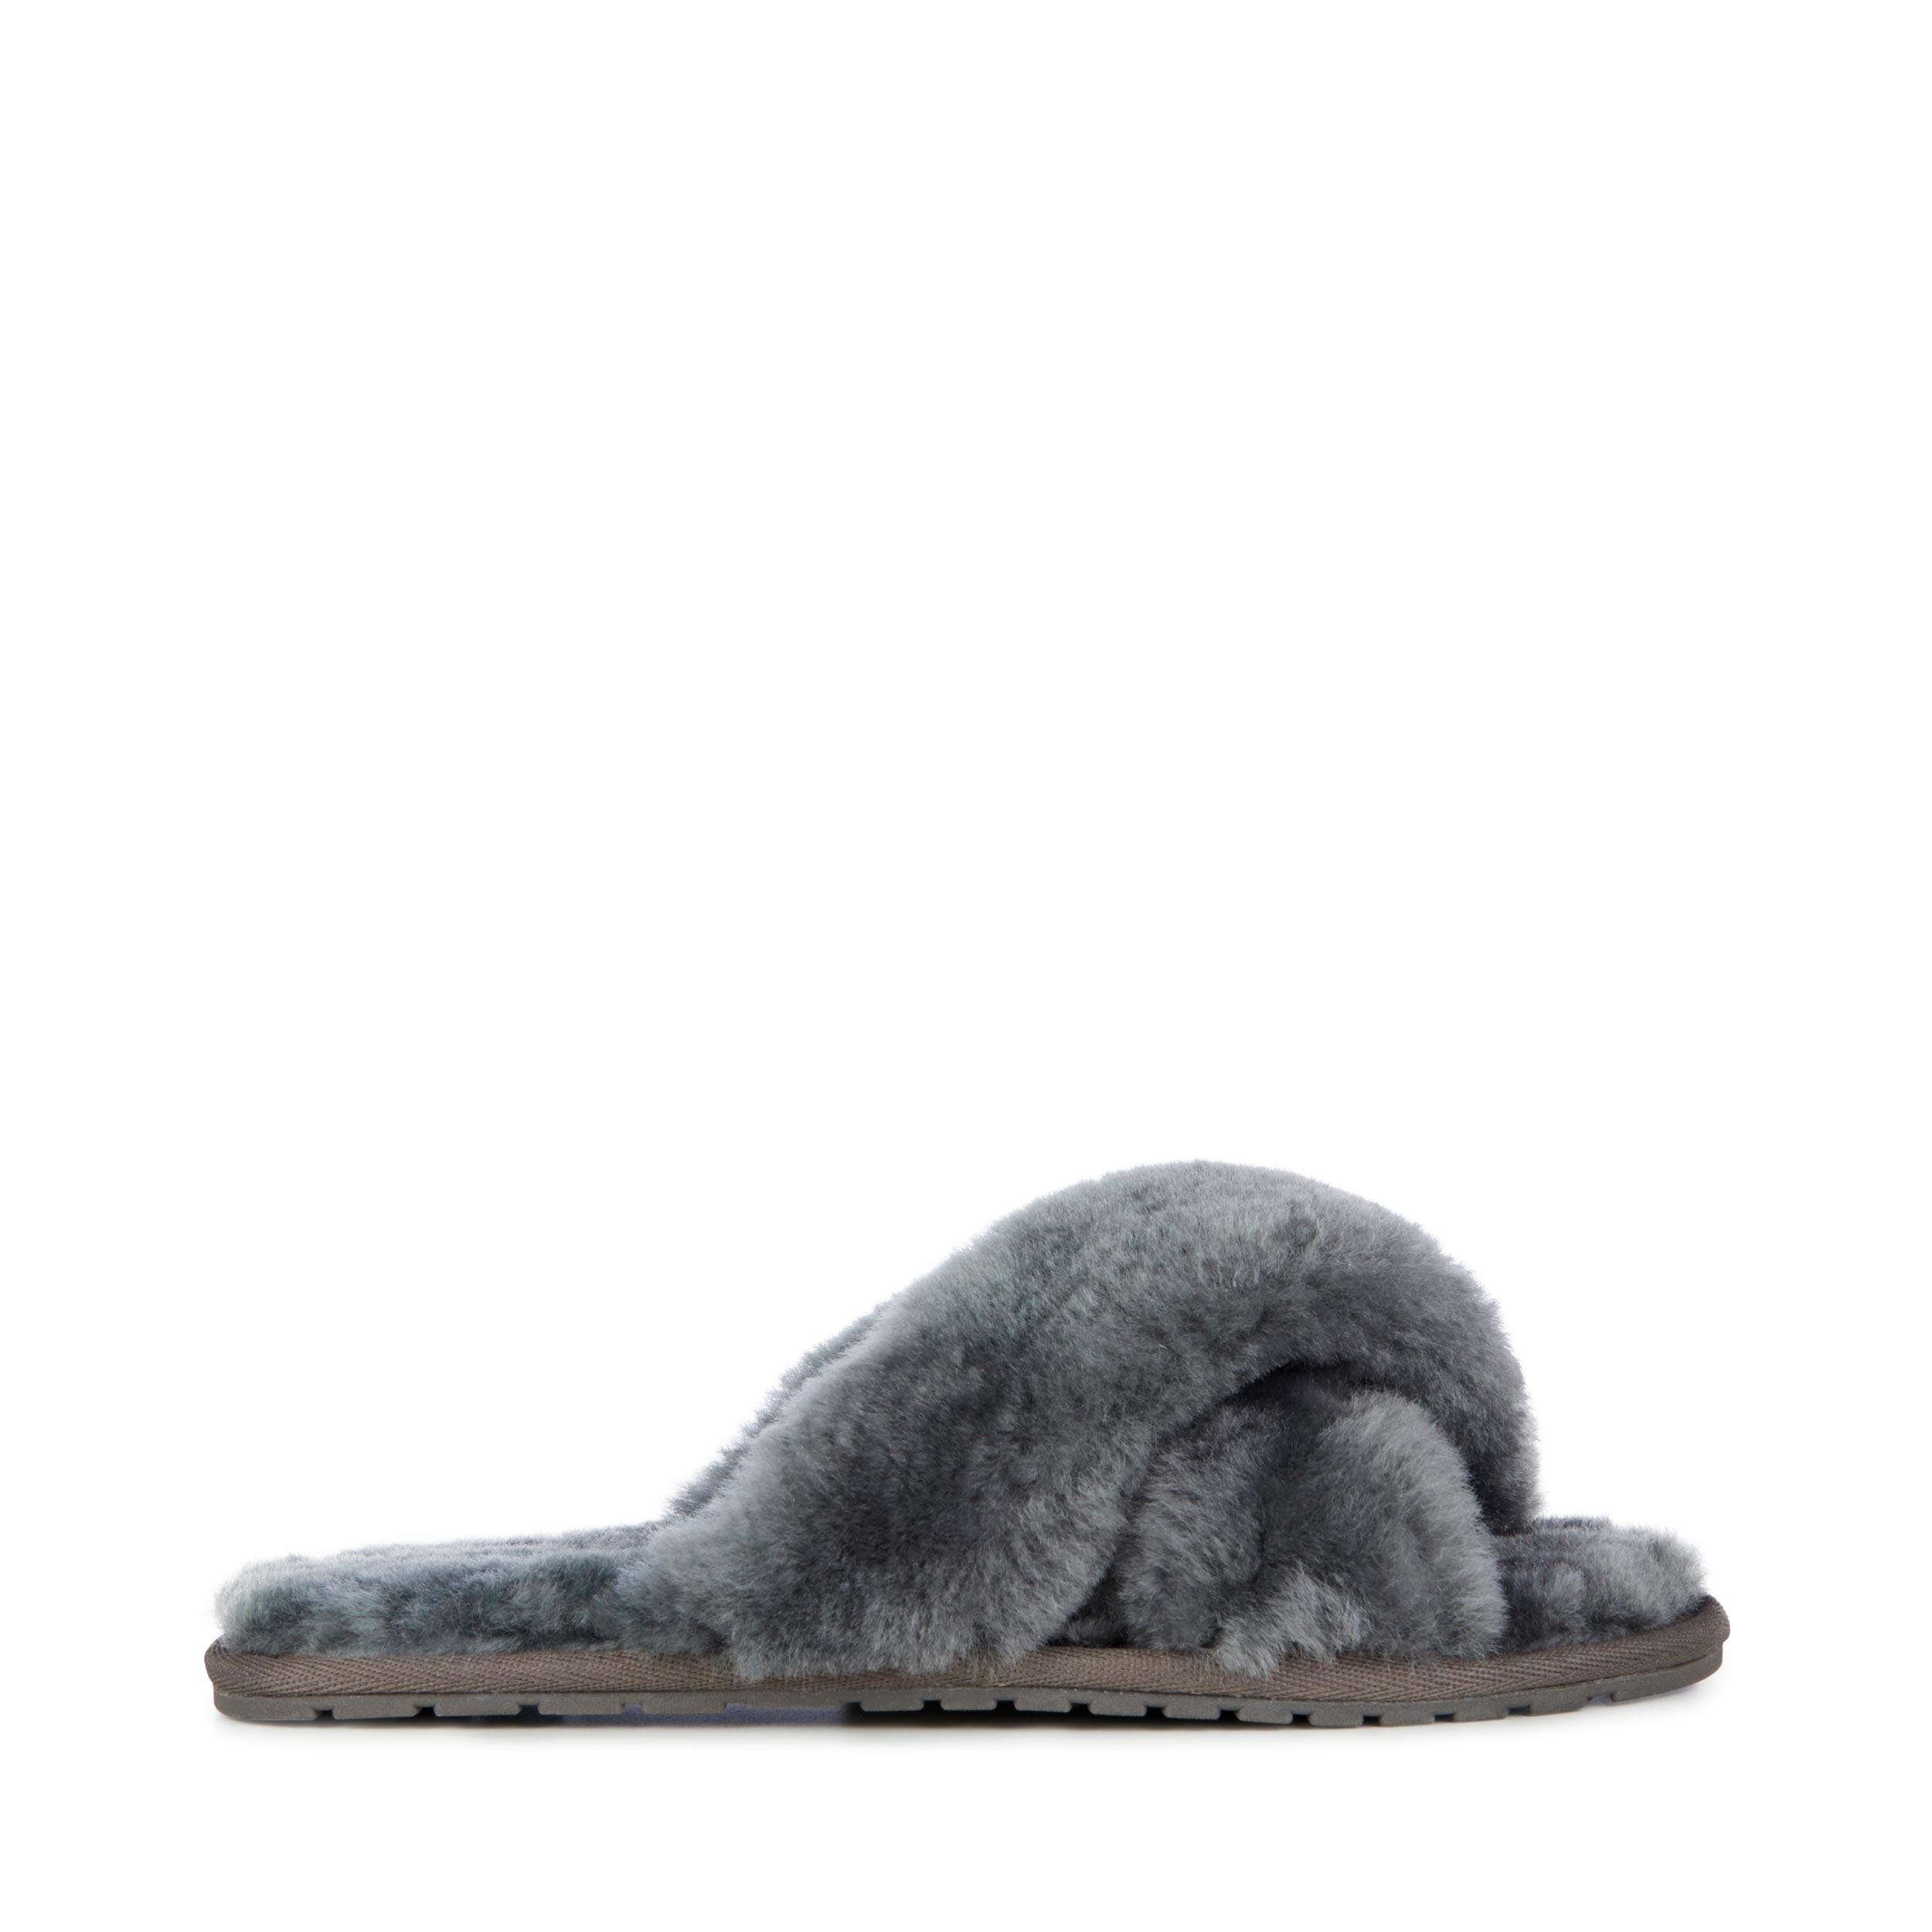 Emu Australia Mayberry Slippers in Charcoal